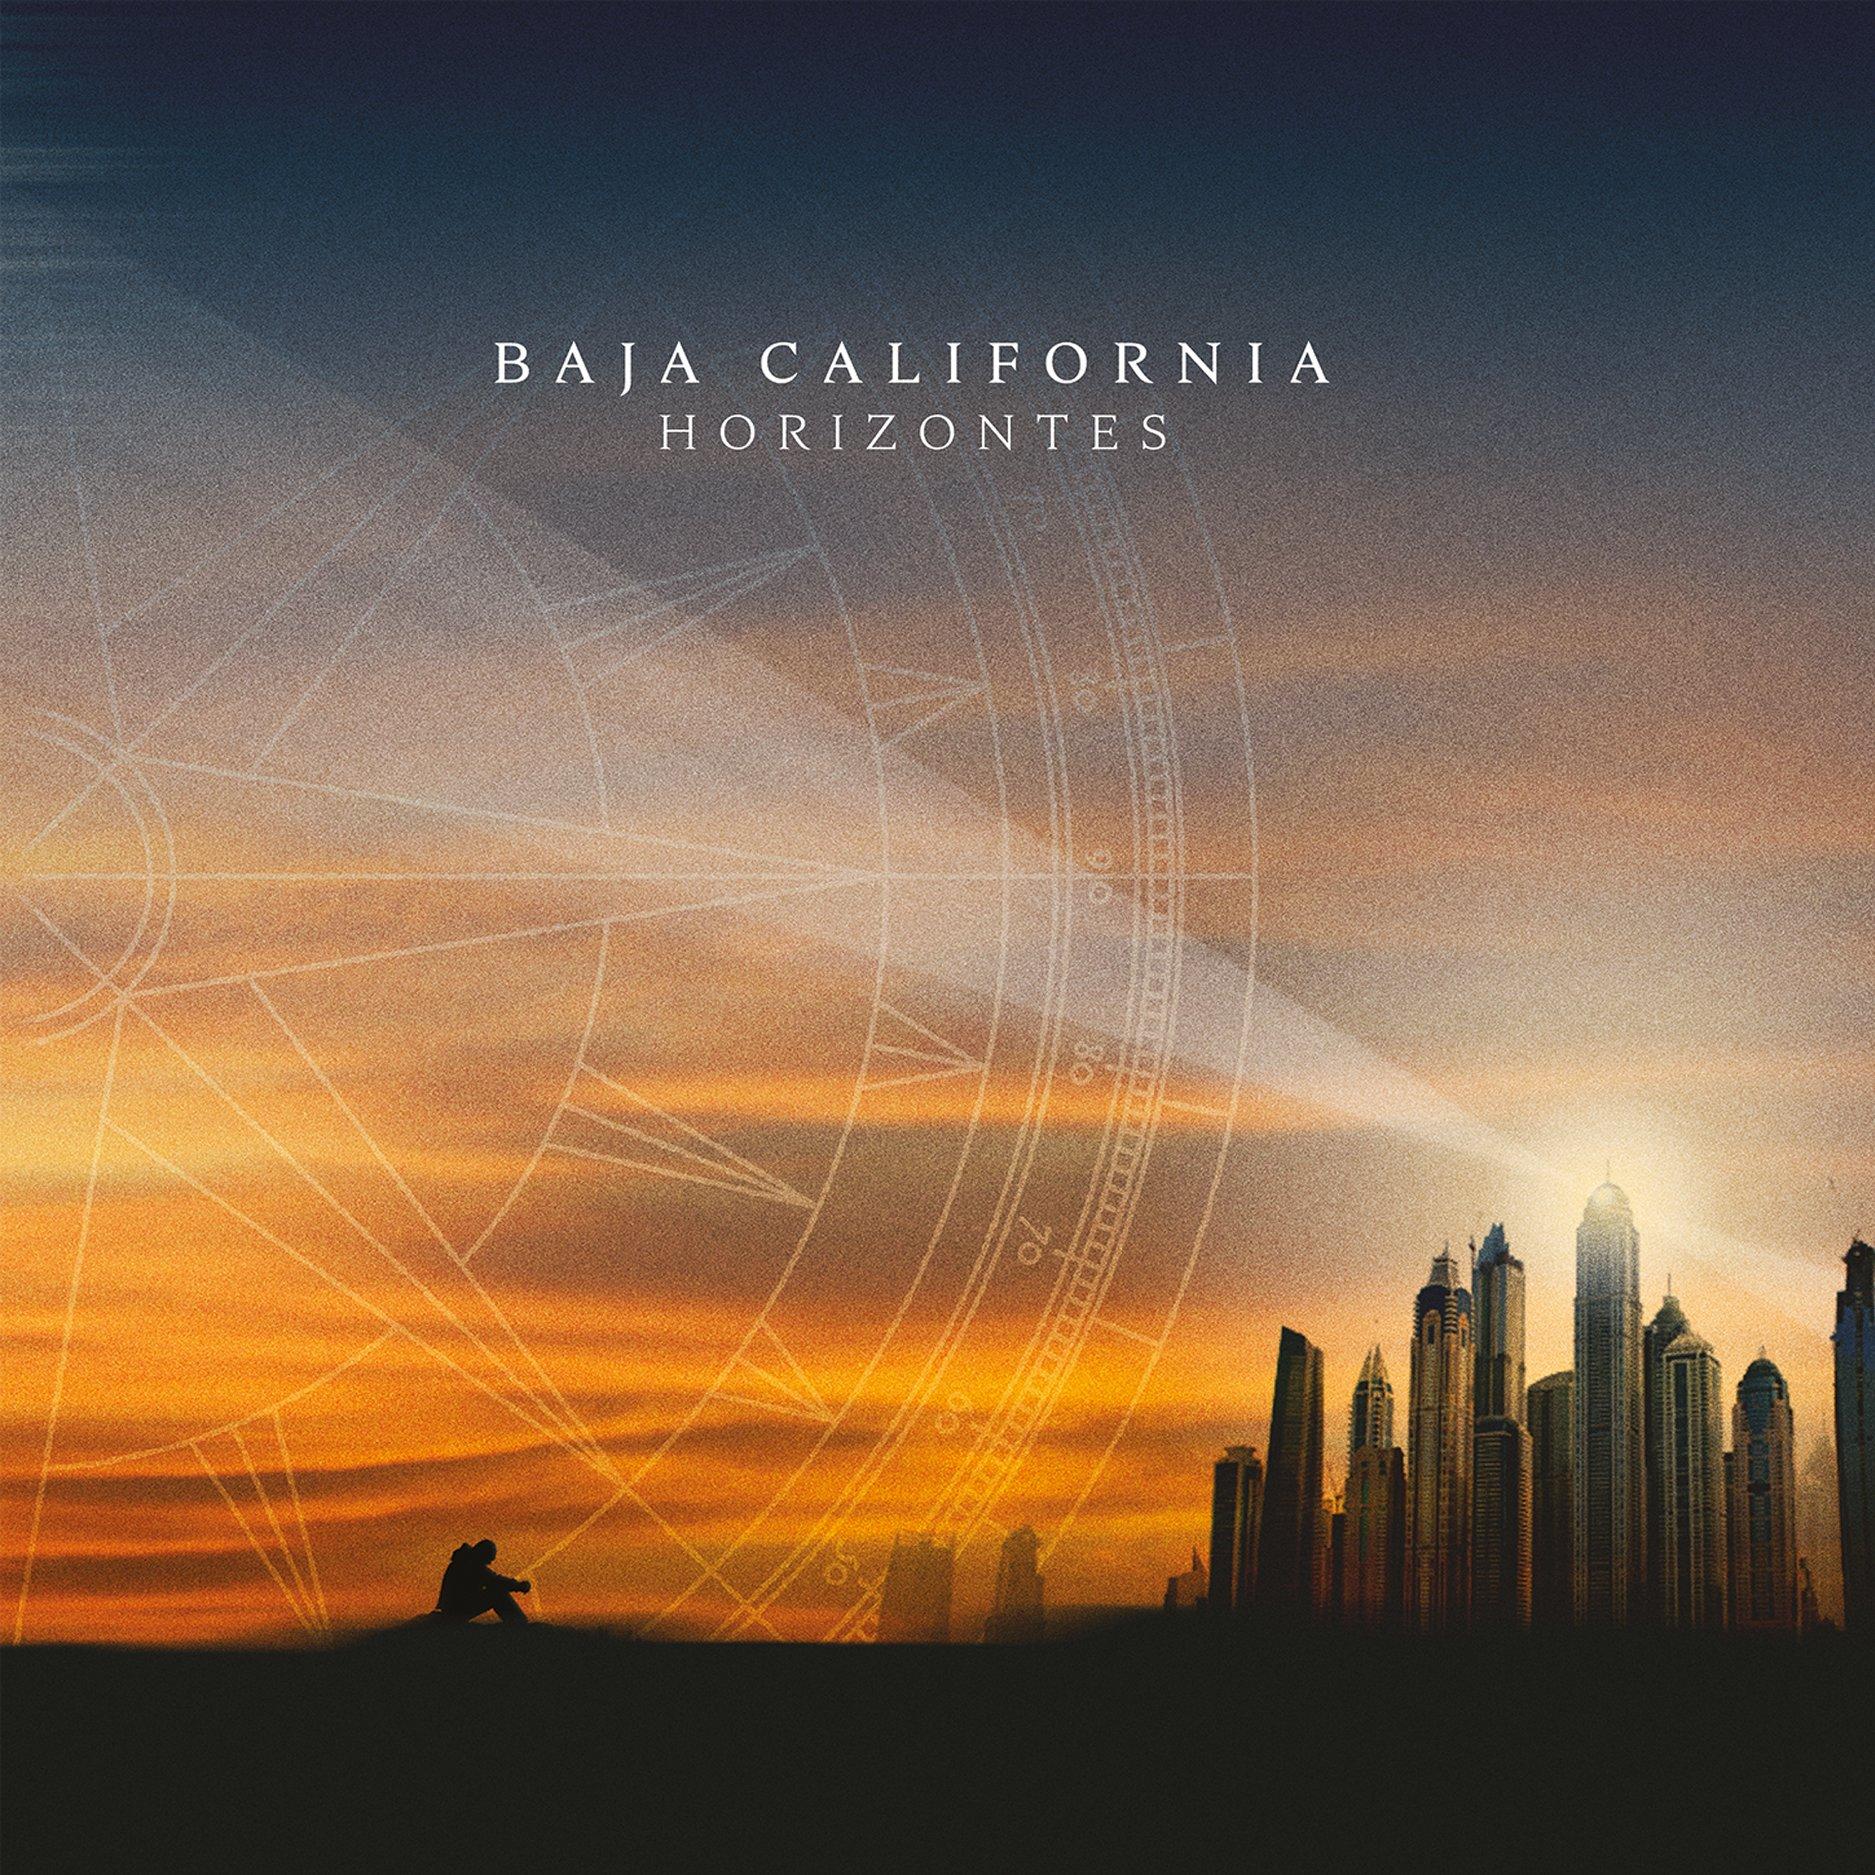 BAJA CALIFORNIA H001